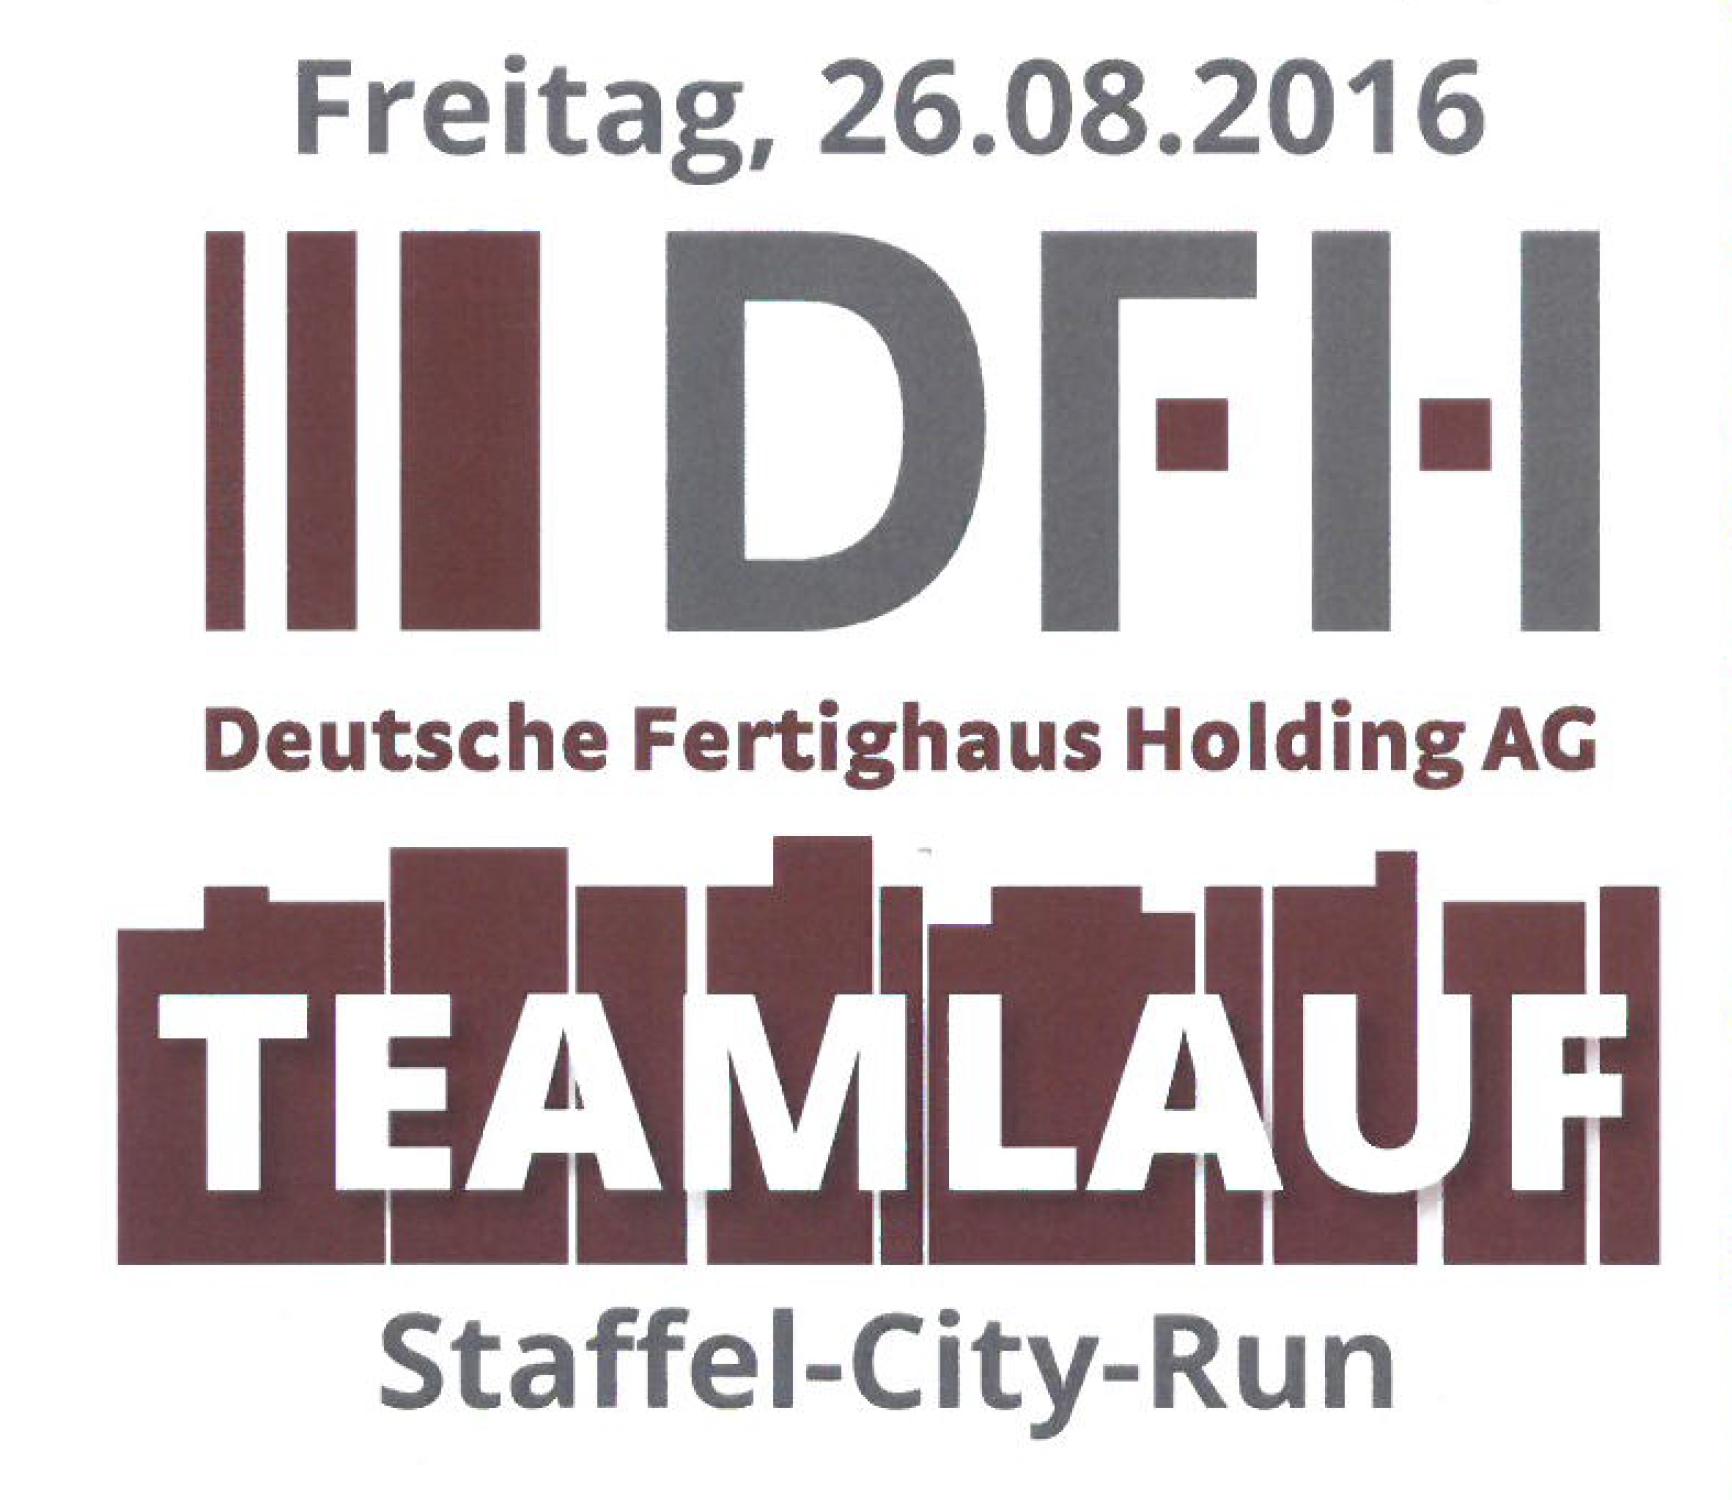 DFH Teamlauf